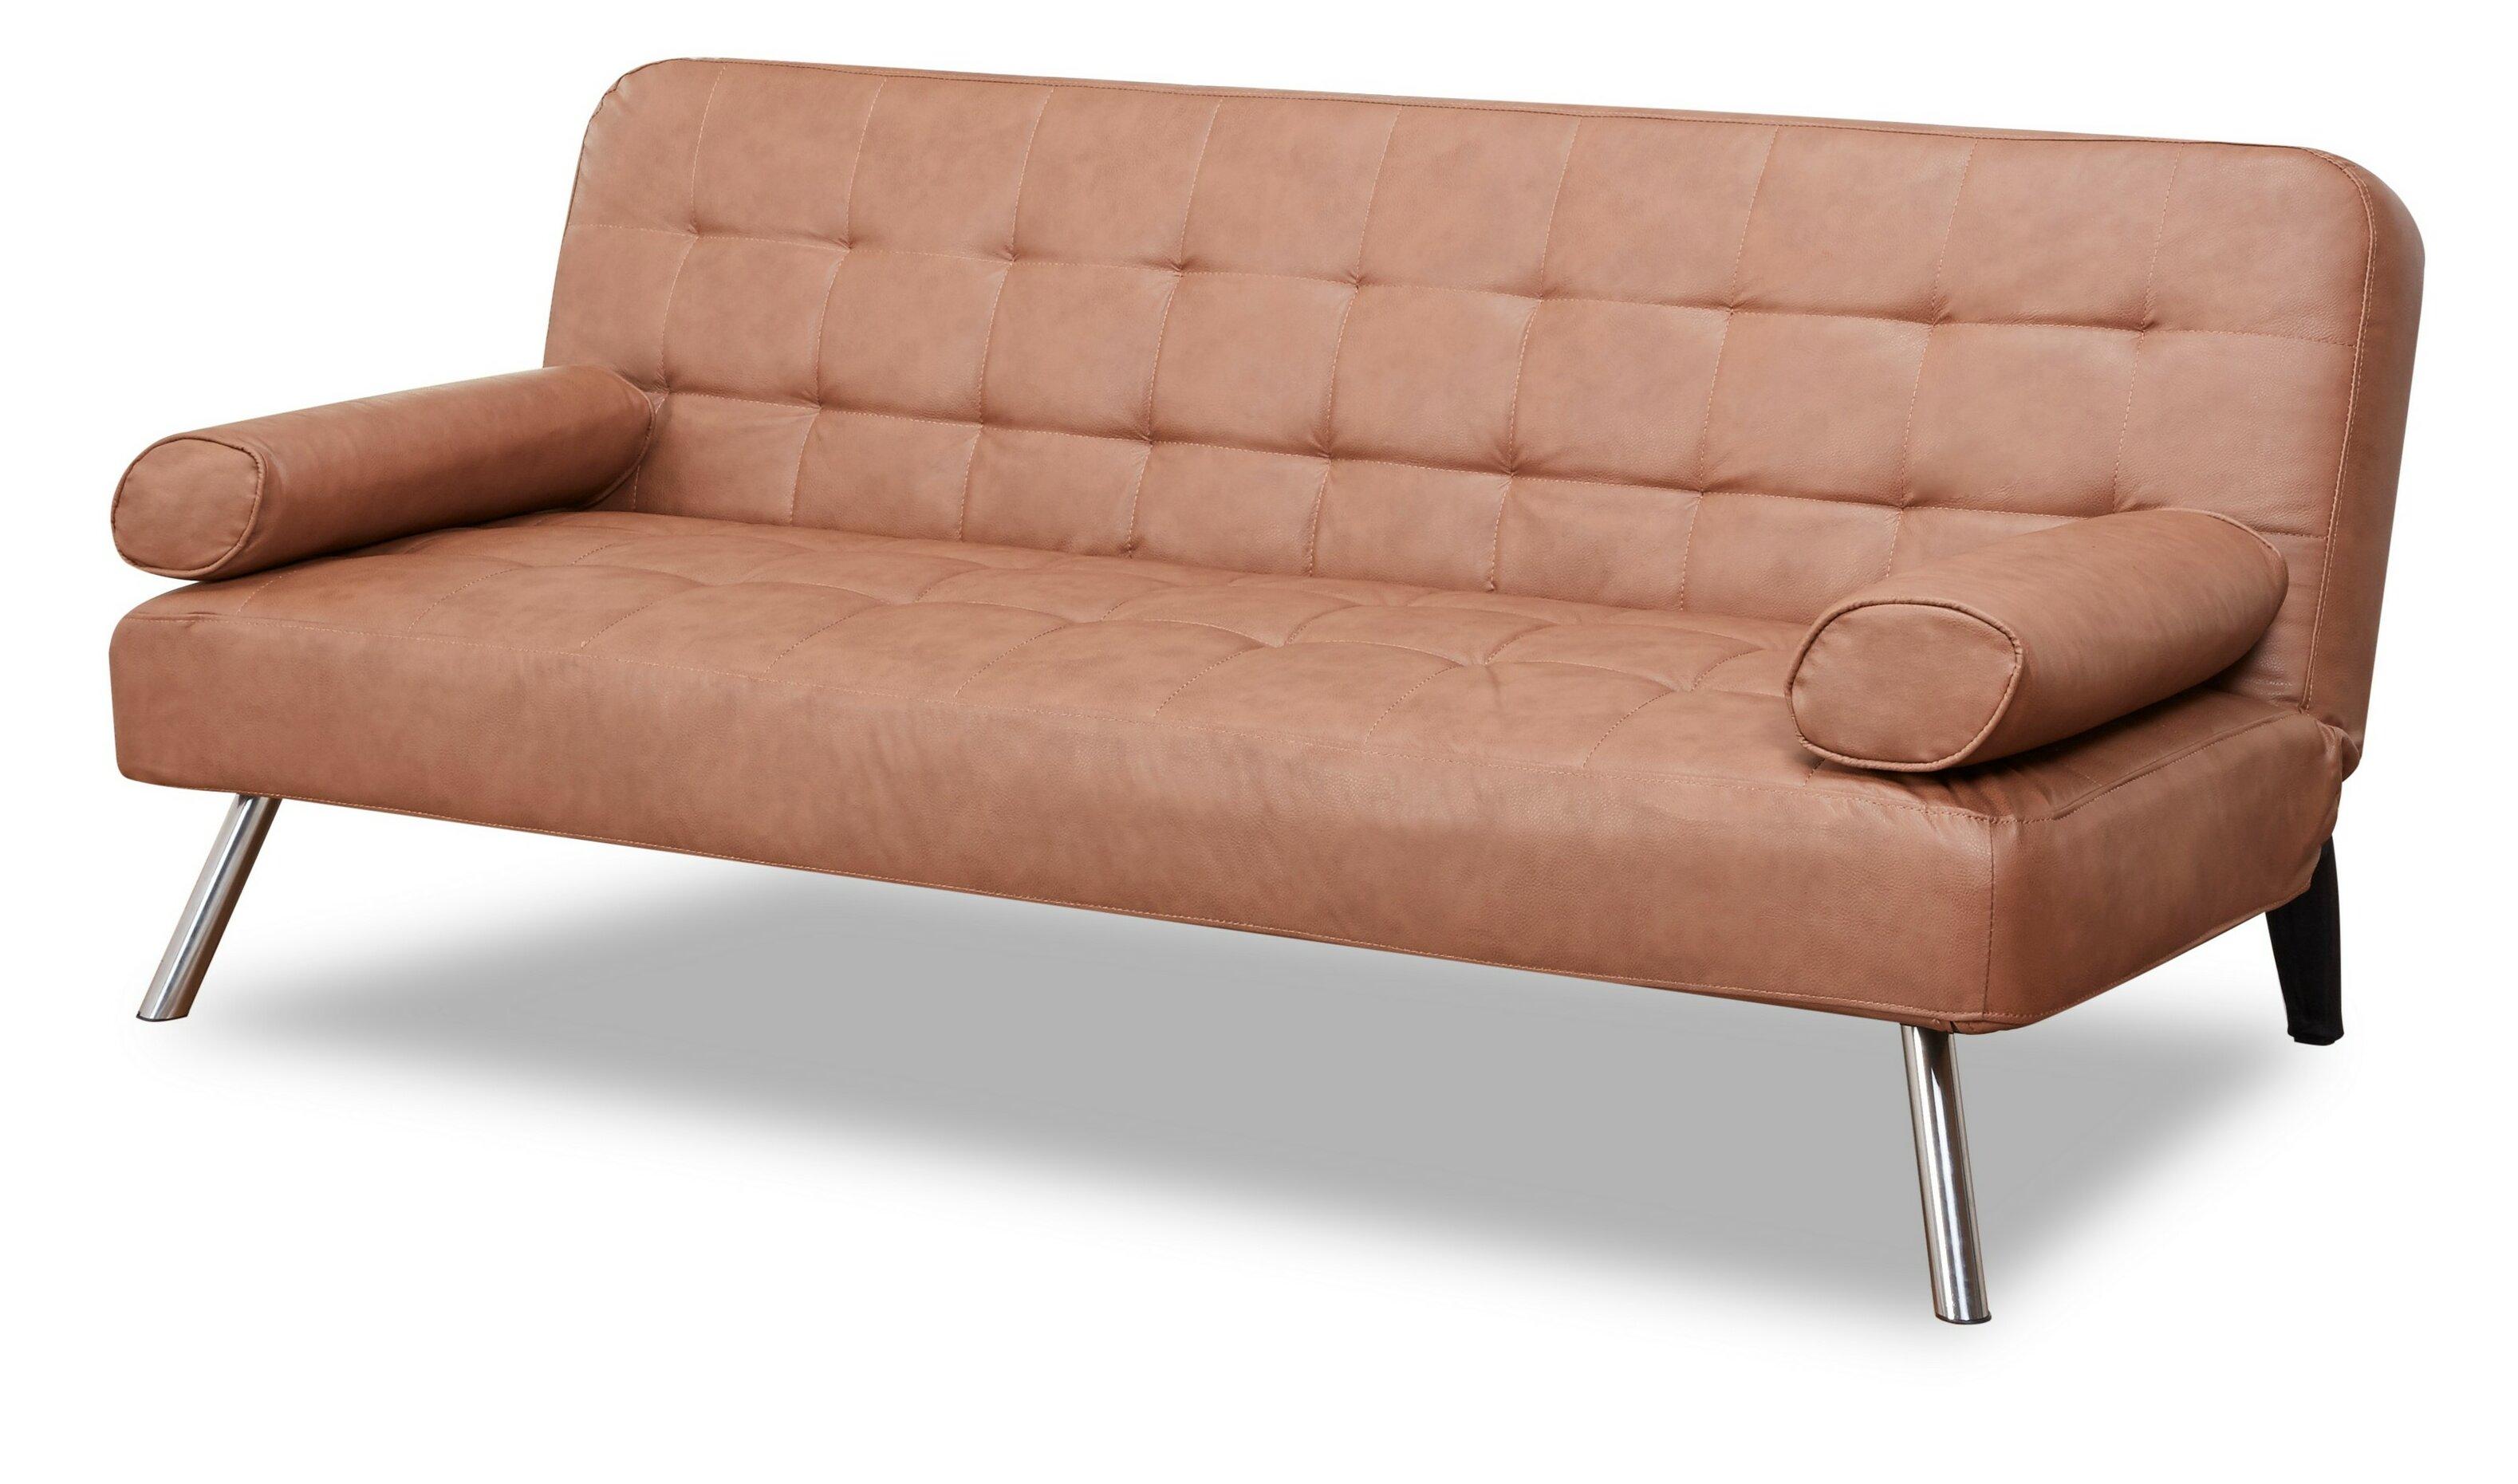 Ratliff 2 Seater Sofa Bed